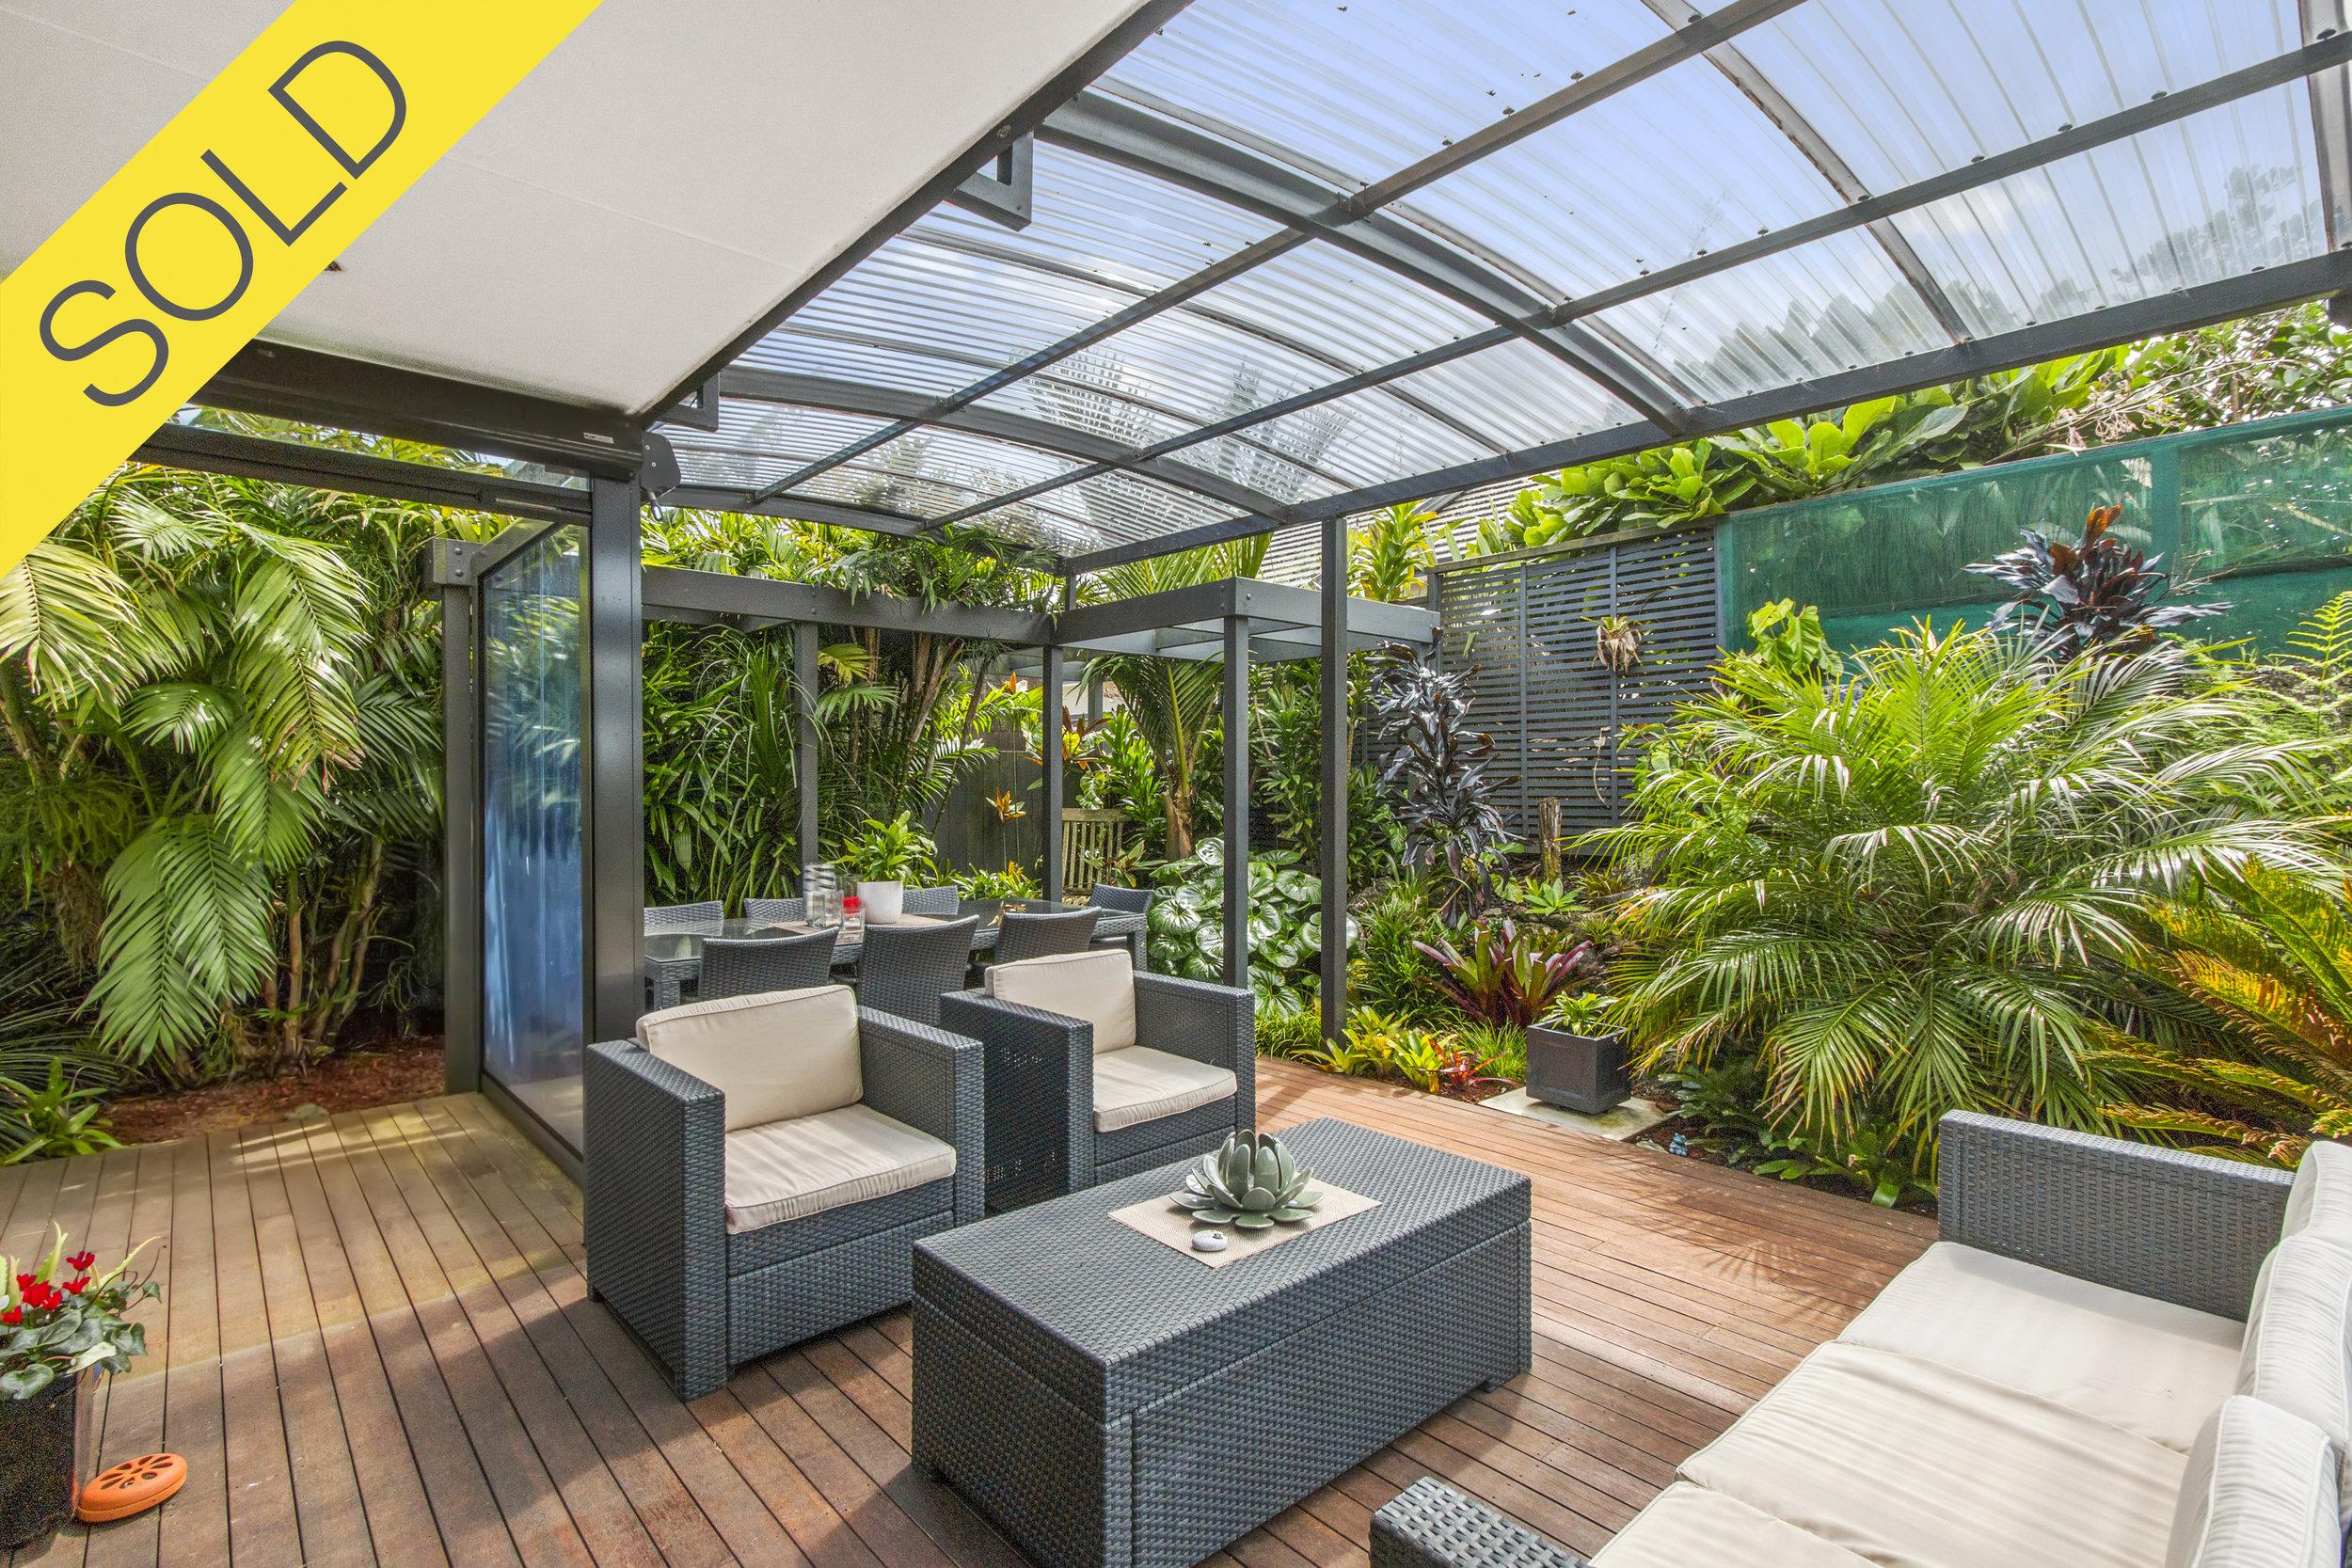 26A Horotutu Road, Greenlane, Auckland - SOLD NOVEMBER 20174 Beds I 3 Baths I 2 Parking